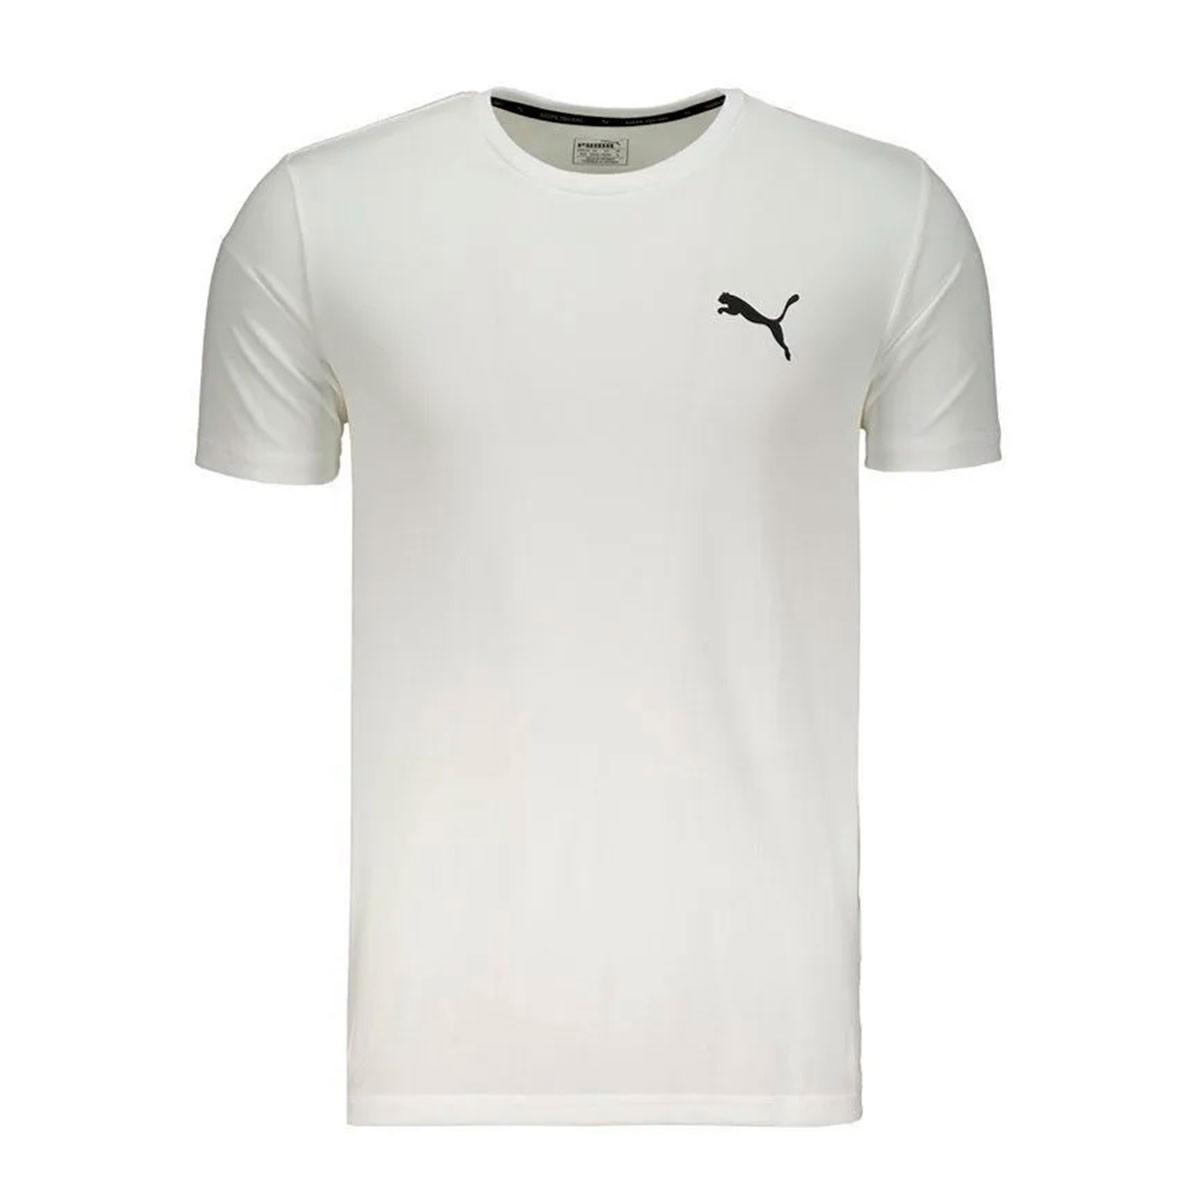 Camiseta Puma Active Masculina - Branco